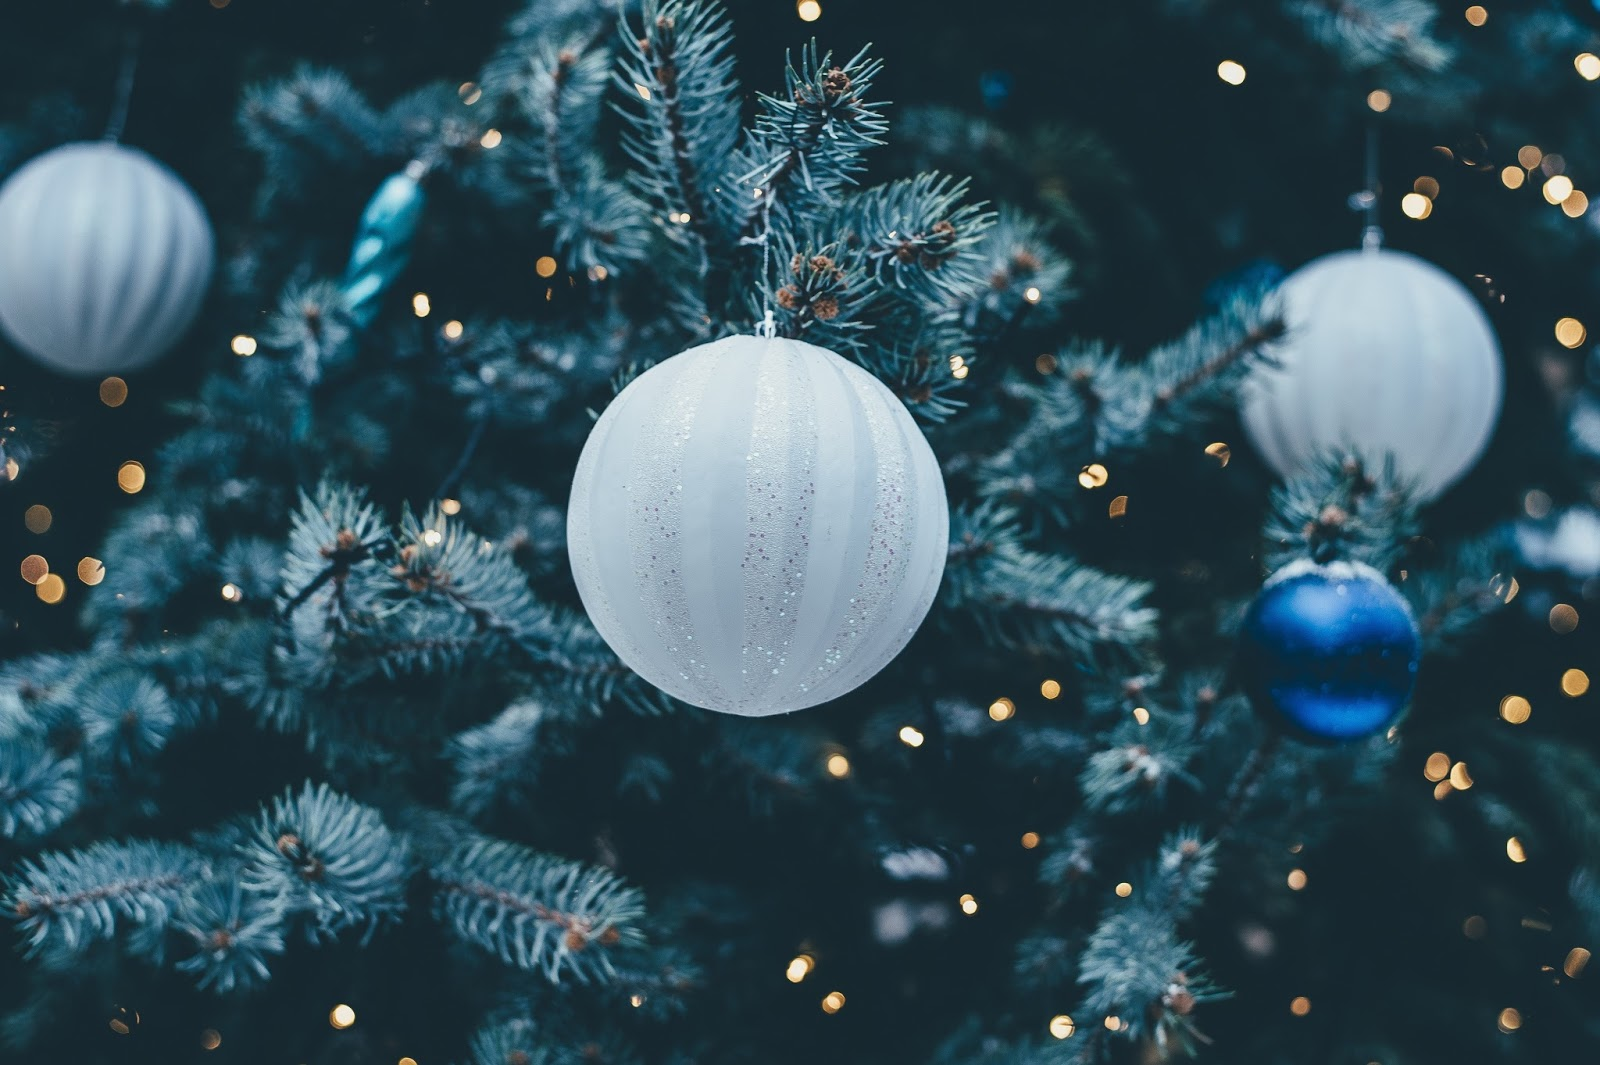 Christmas Wallpaper 2016, Merry Christmas Wallpaper 2016, Merry Christmas 2016 Wallpaper, Christmas 2016 Wallpaper, Merry Christmas 2016, 2016 Christmas Wallpaper